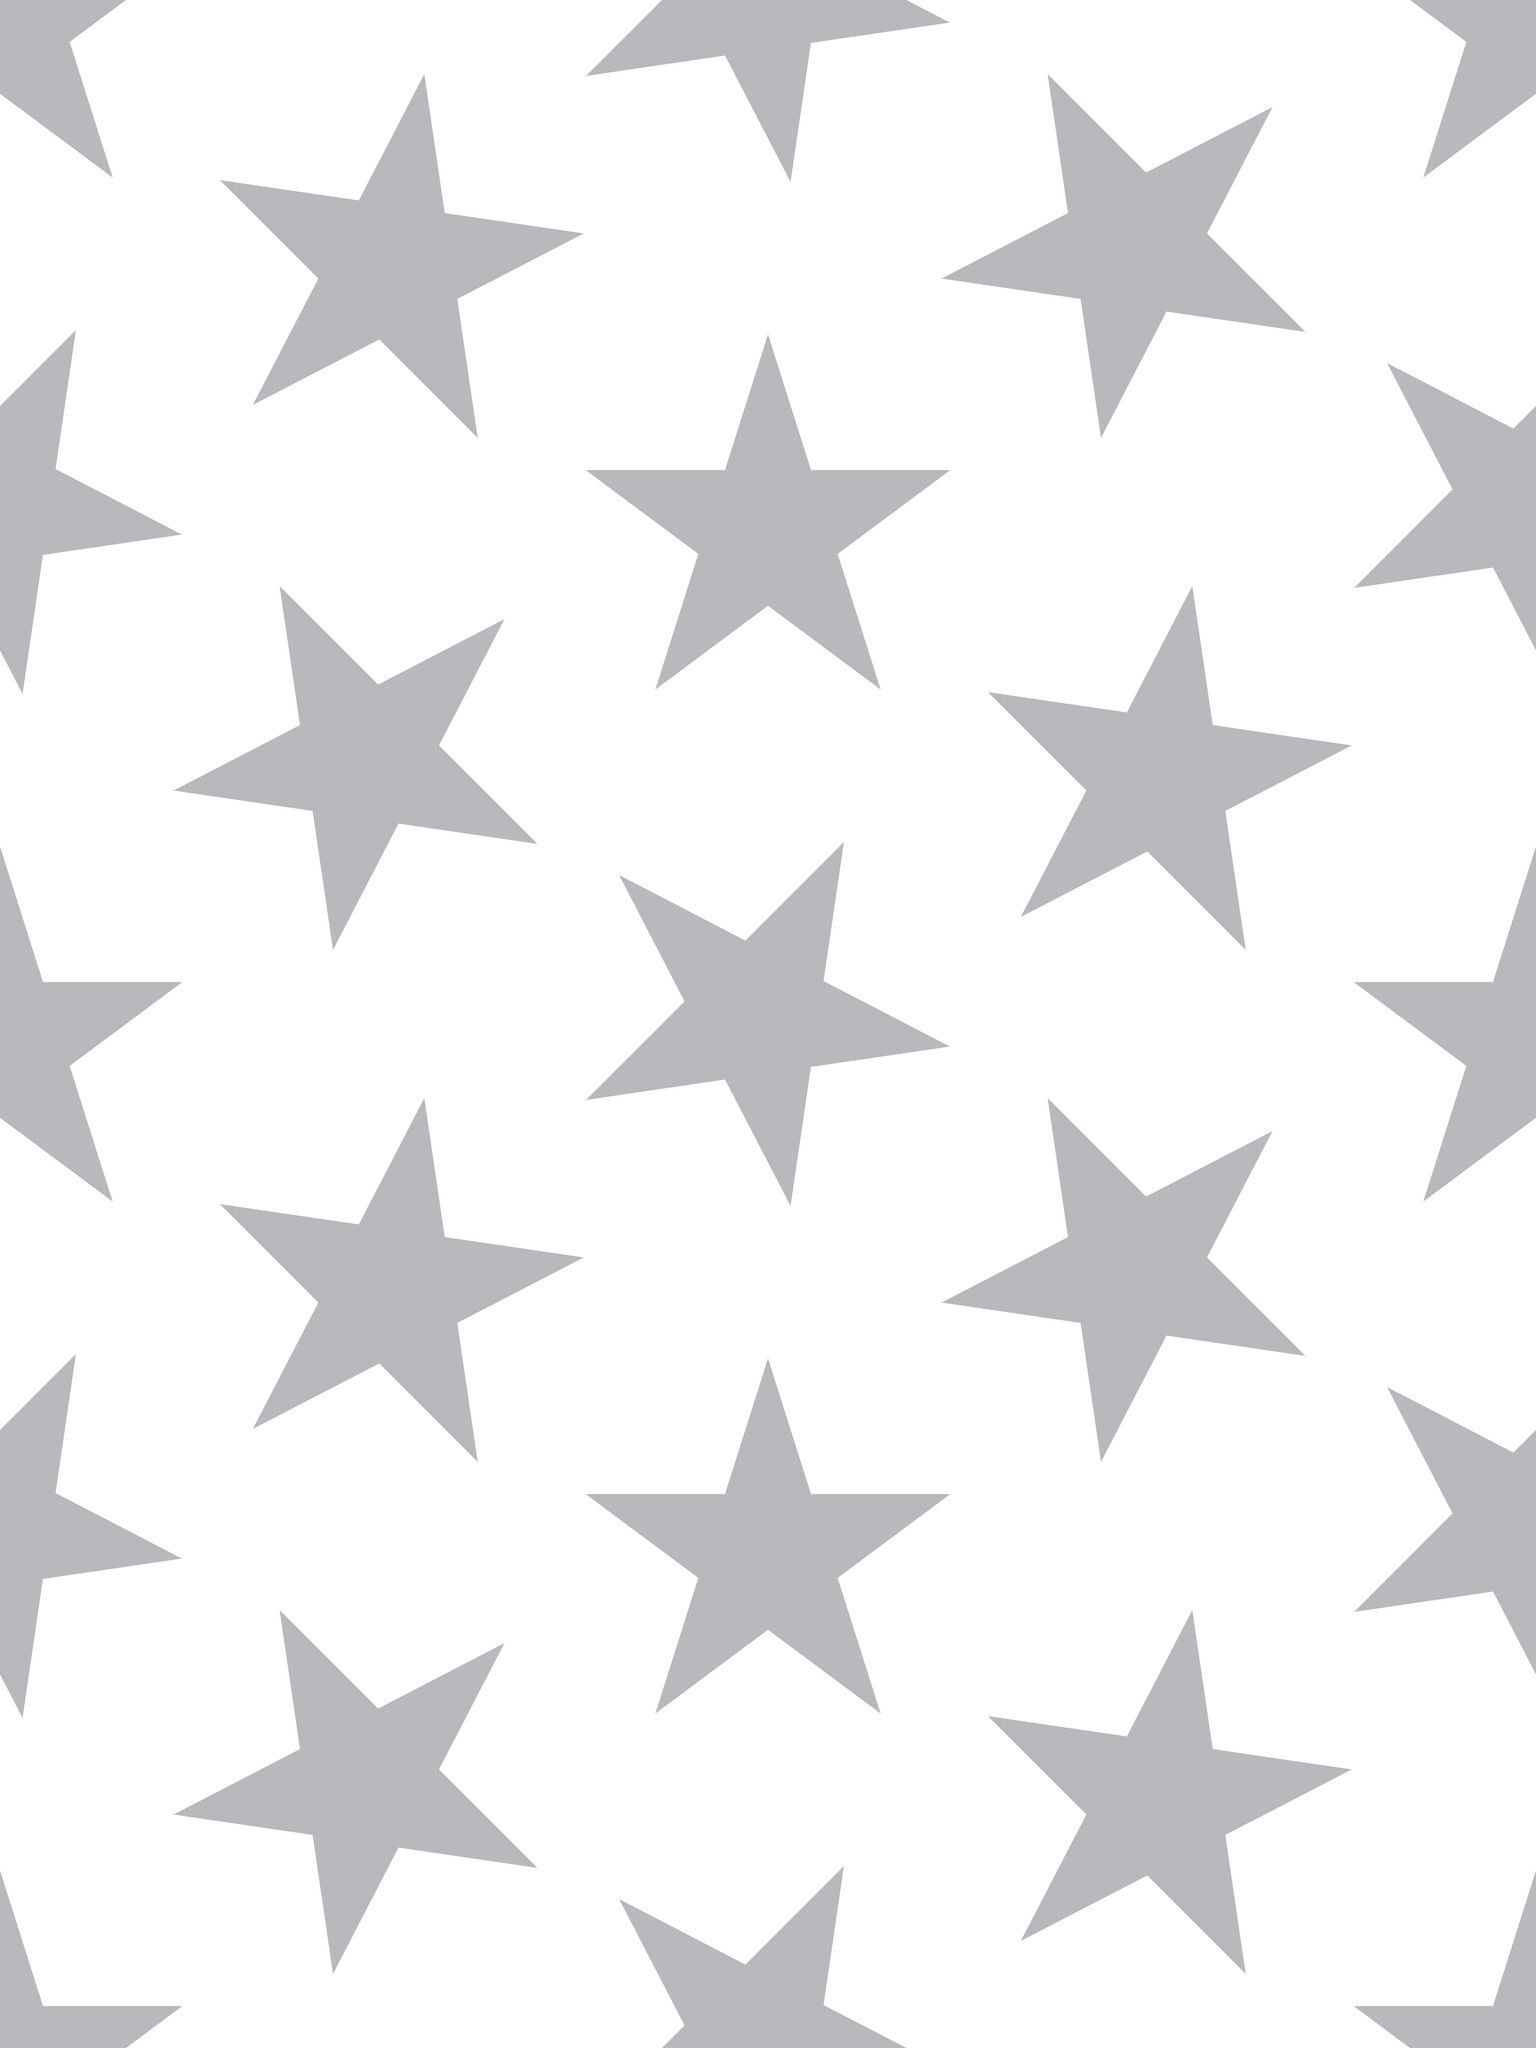 boys room lucky star wallpaper in silver metallic by sissy marley for jill malek - Metallic Kids Room Interior